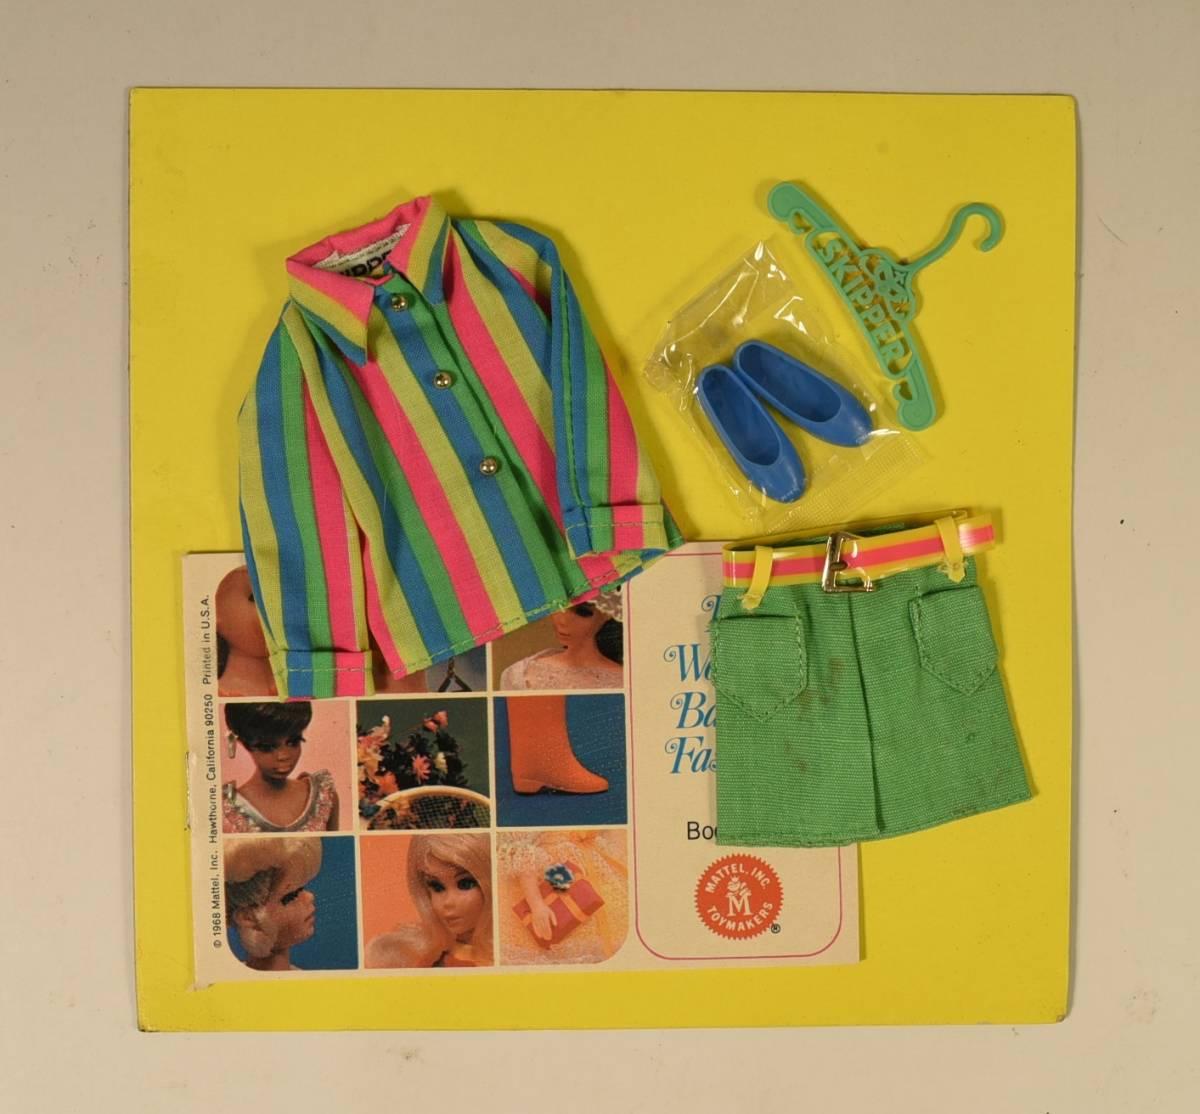 Barbie・Skipper洋服 「Hopscotchins」1969年 #1968・Vintage・NRFB